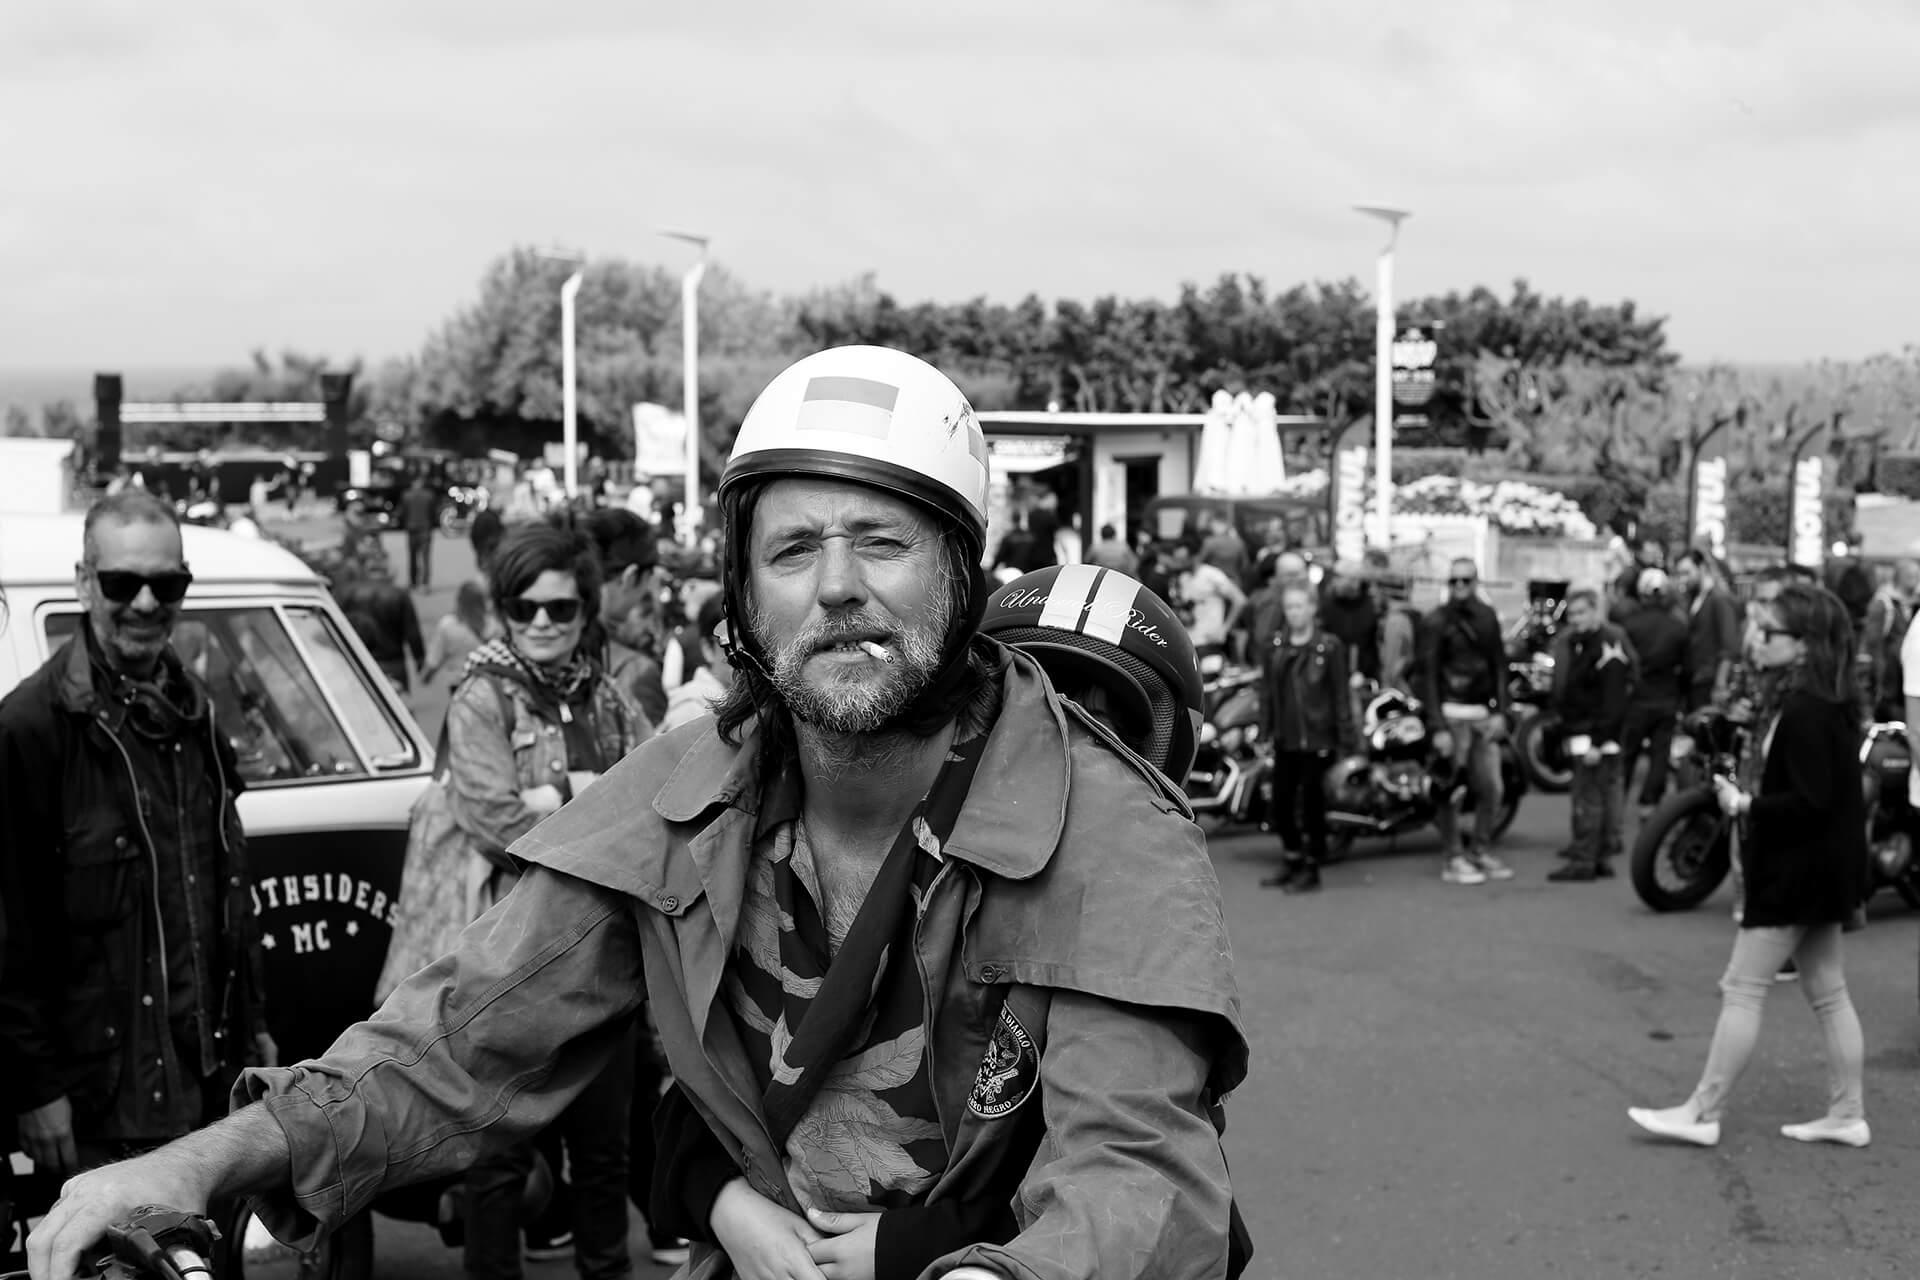 Wheels, Waves, Wheels and Waves, fashion, helmet, sparkle, biker, motorcycle, bike, france, film, photography, event, WeAreShuffle, agency